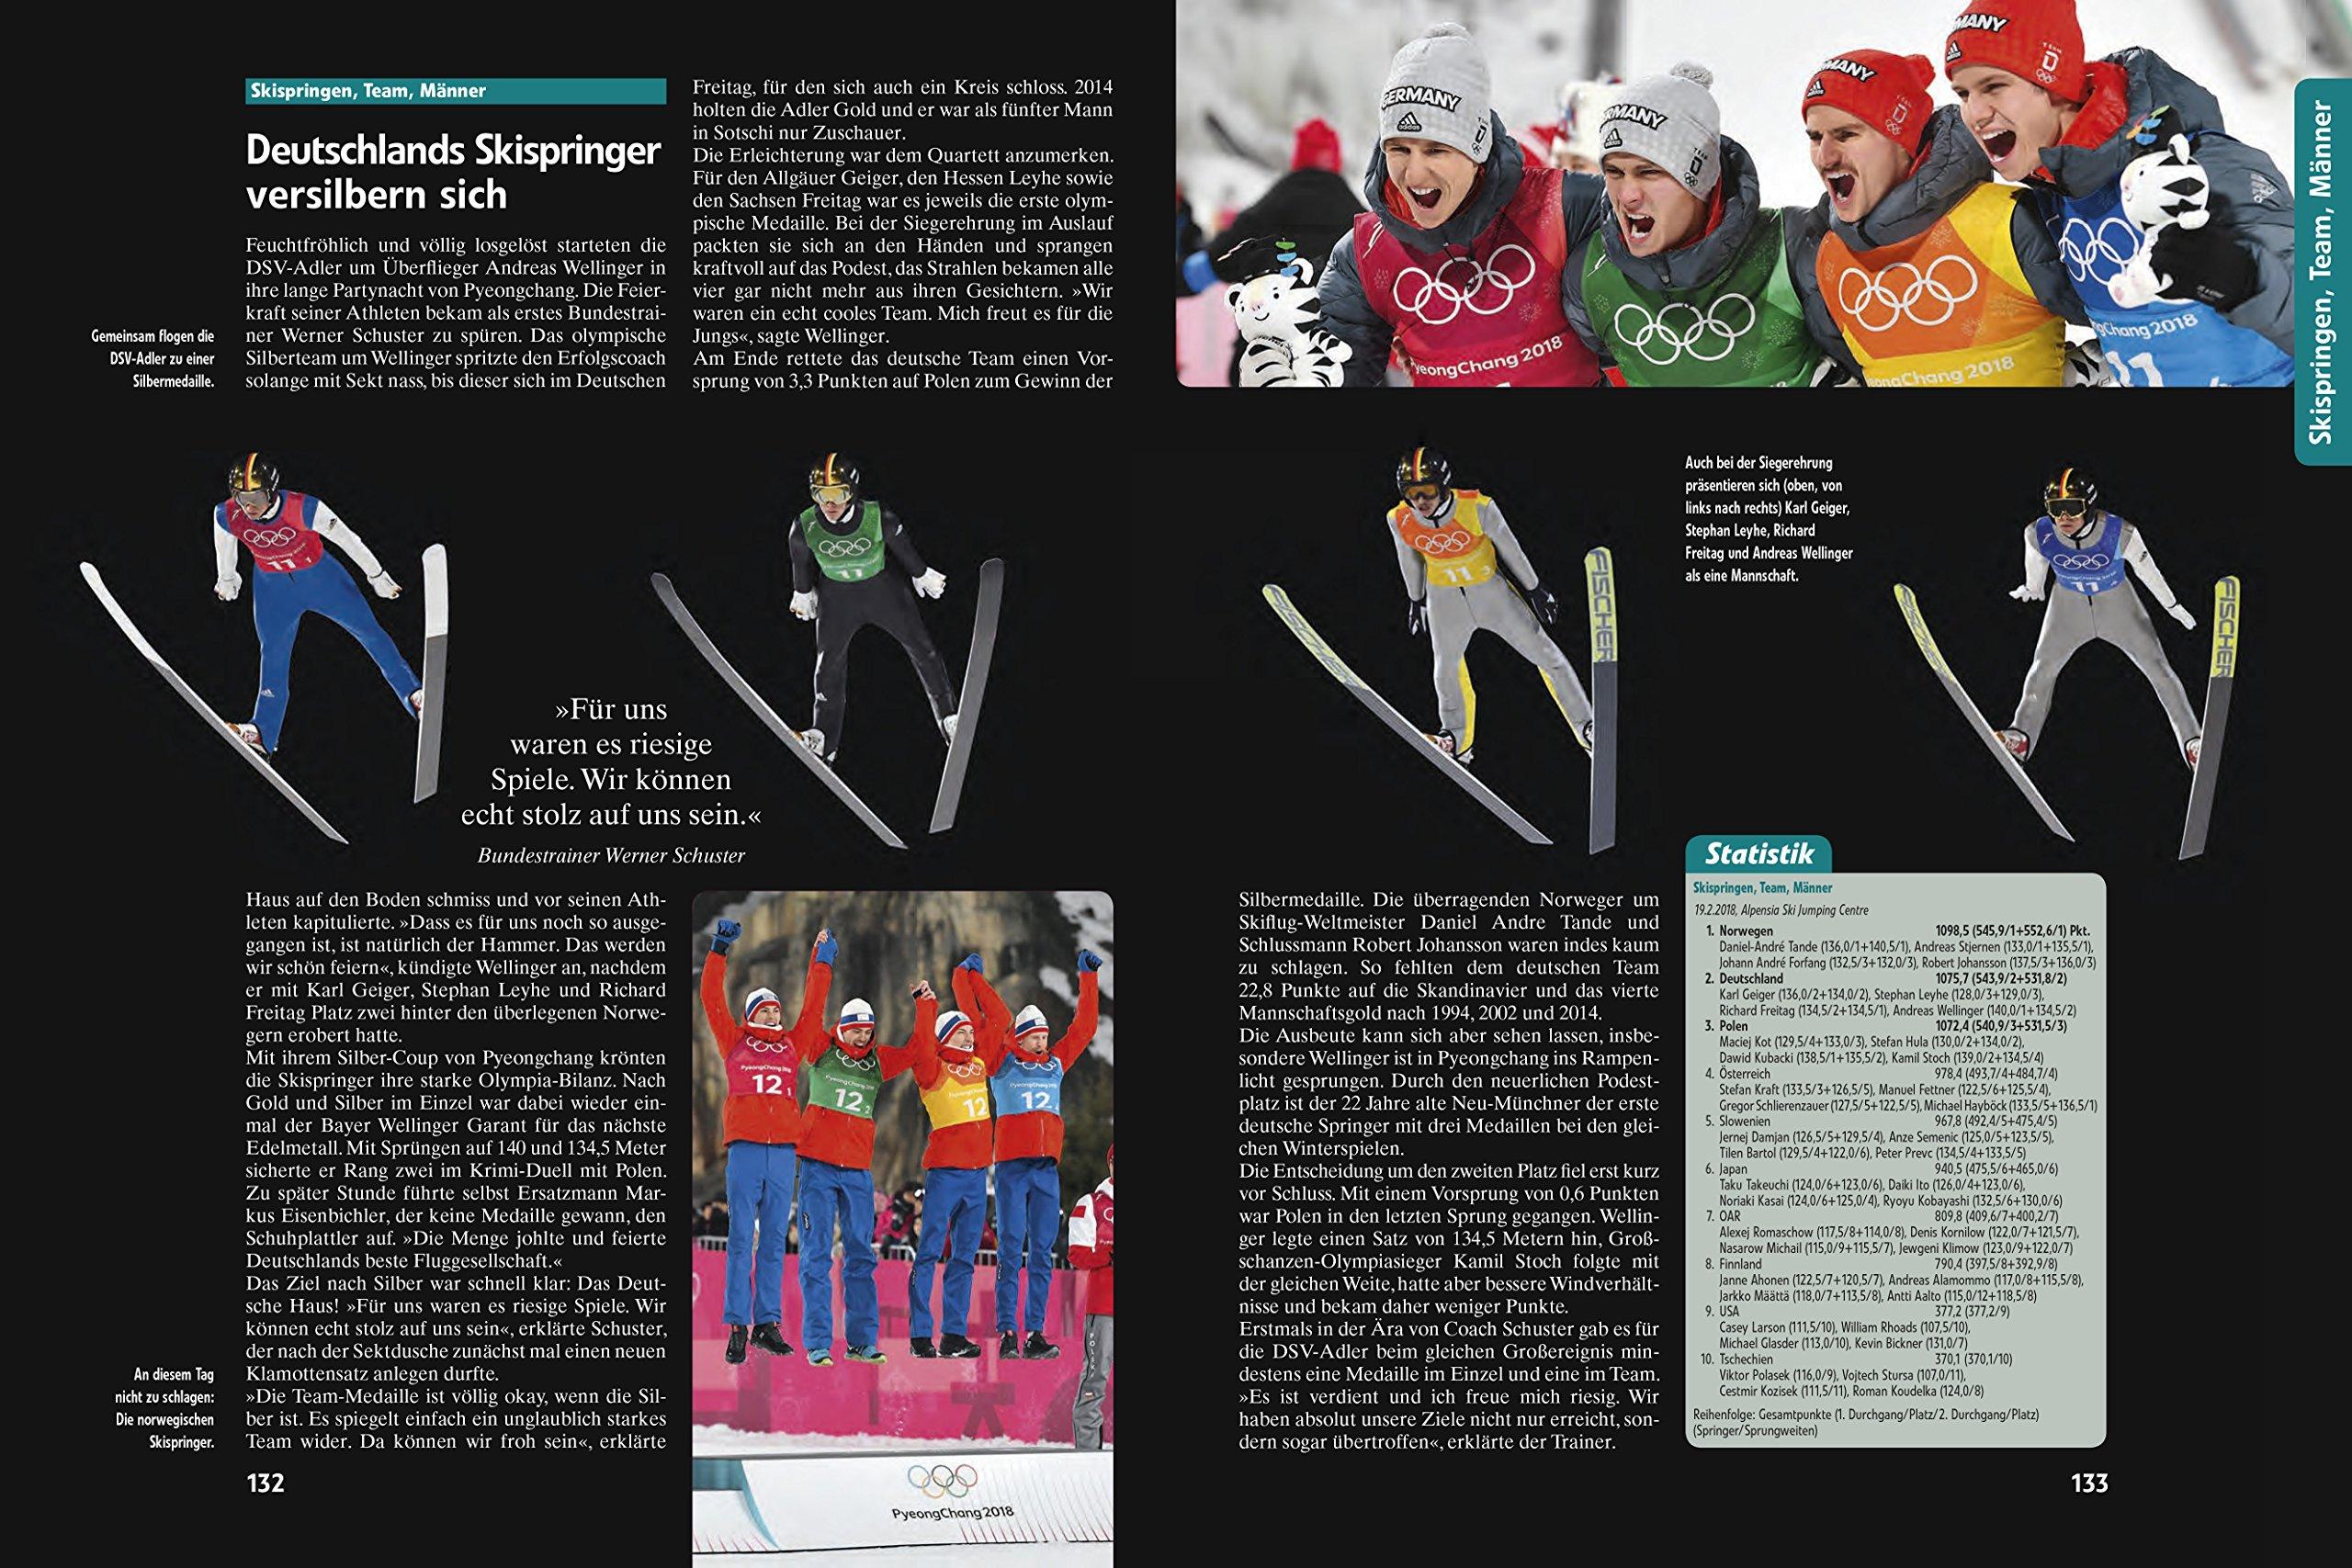 Olympische Winterspiele Pyeongchang 2018 Amazonde Dpa Deutsche